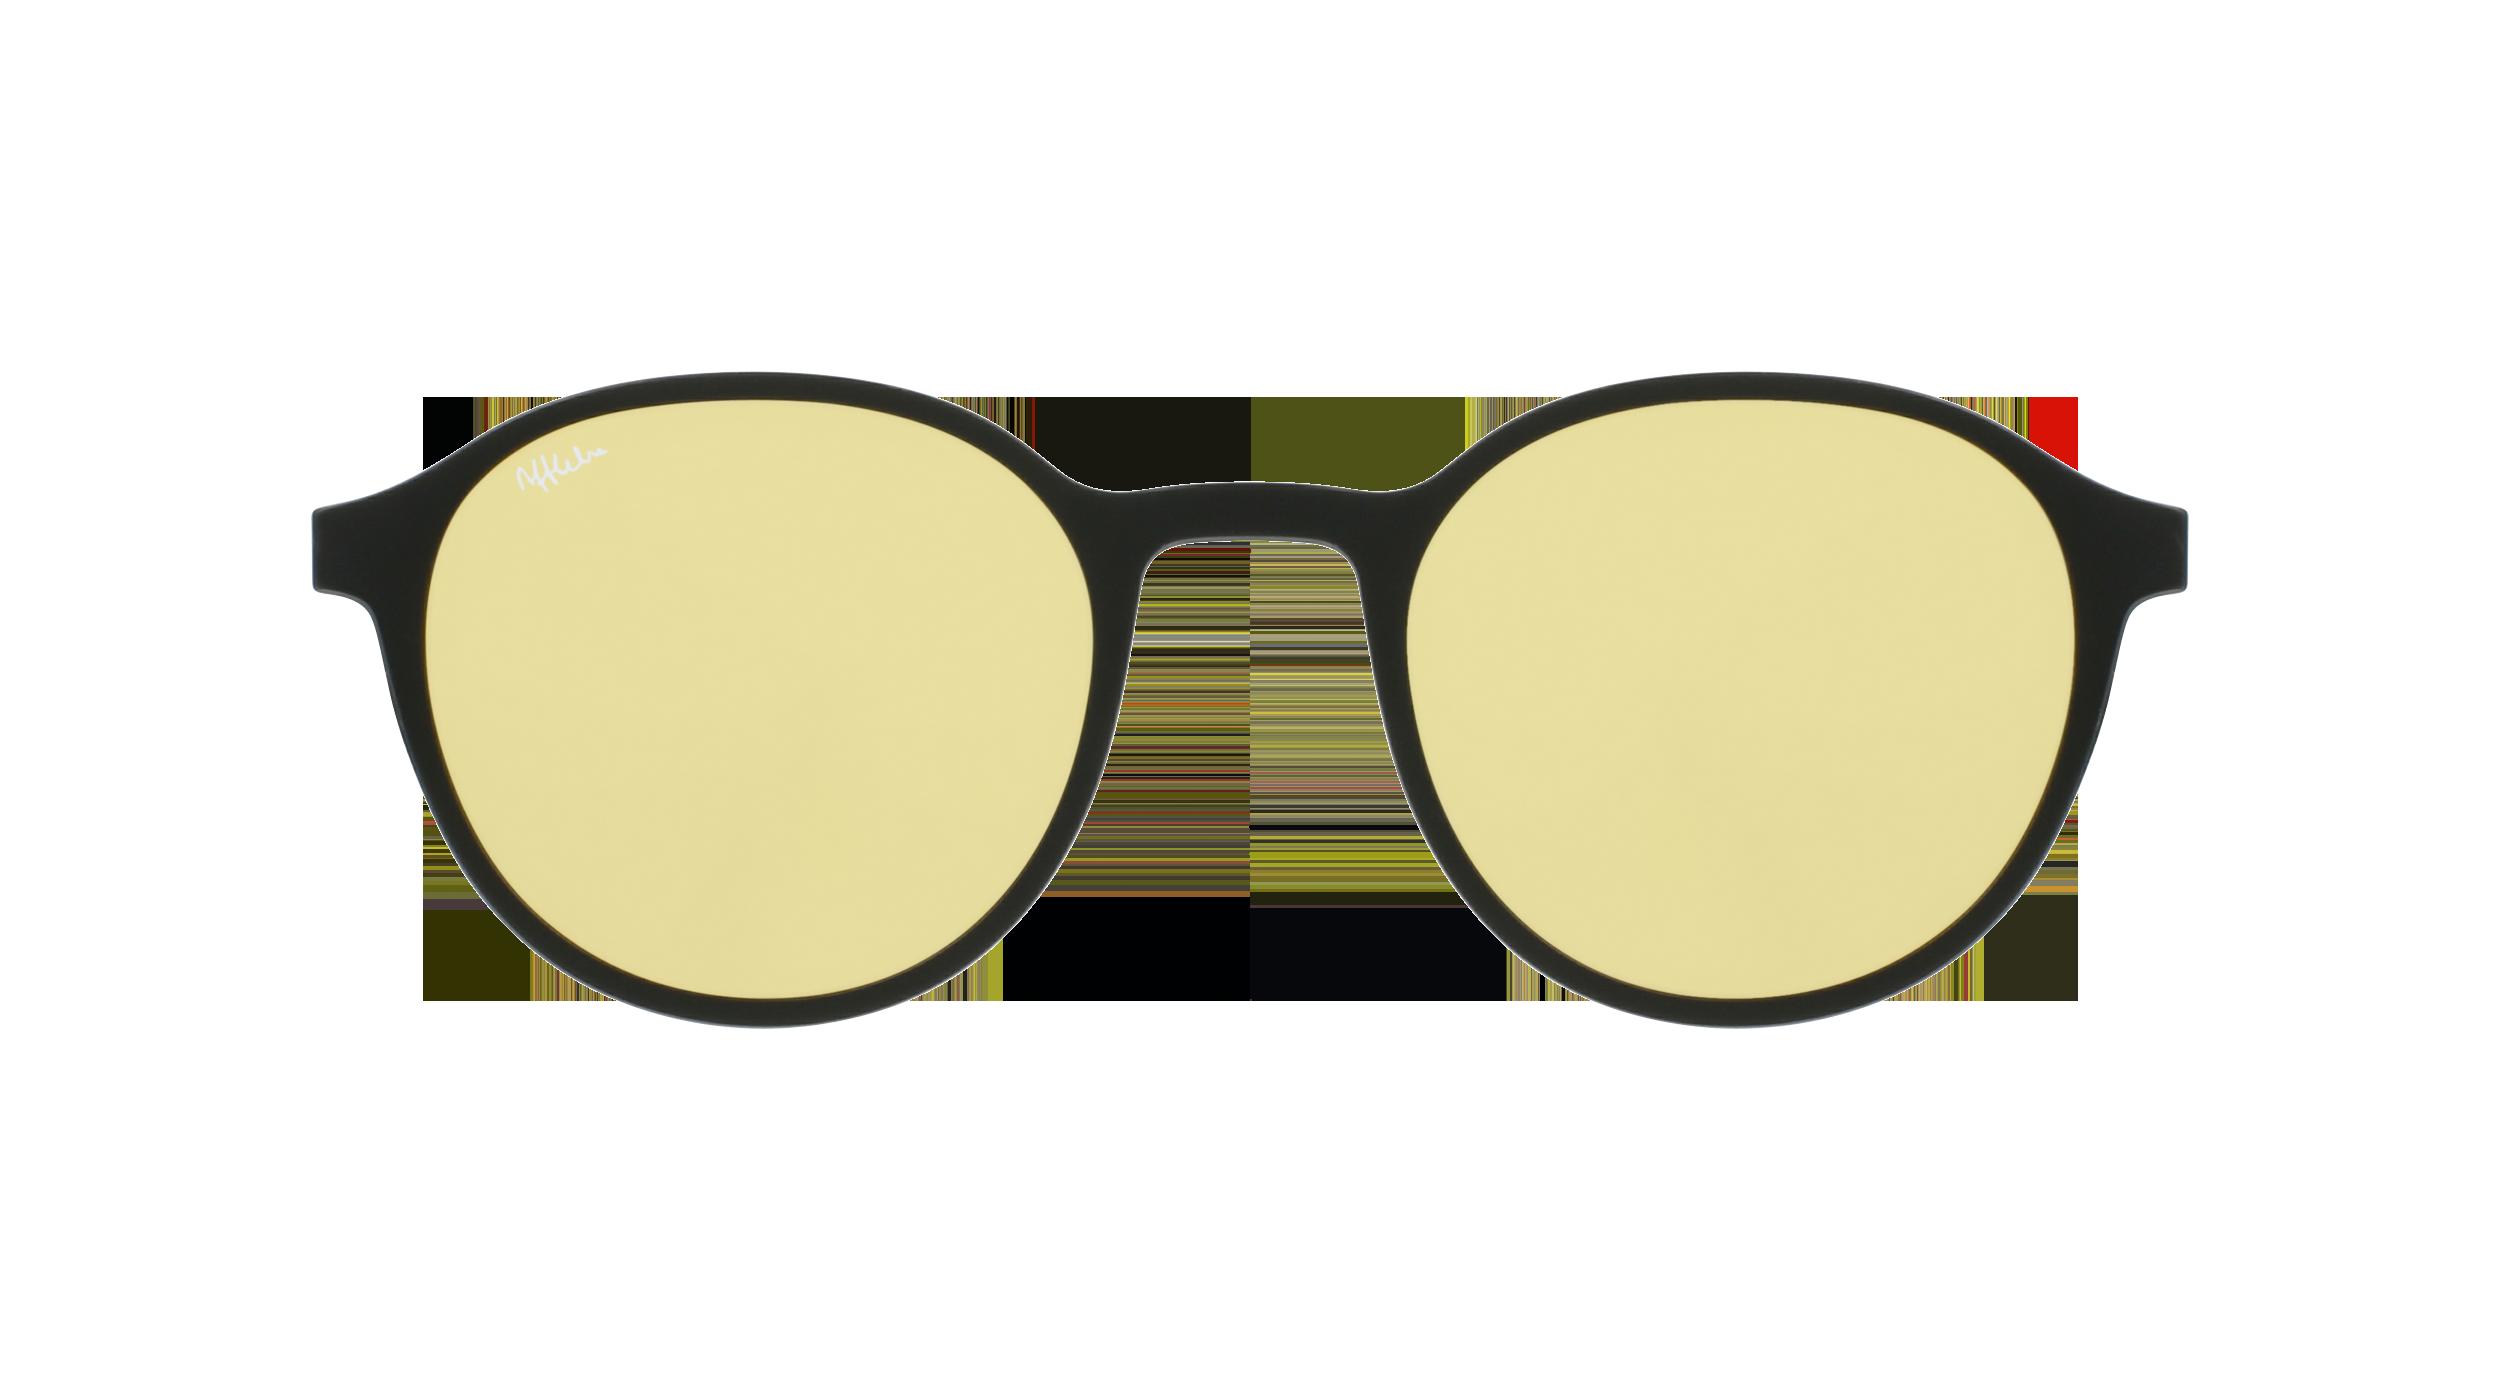 afflelou/france/products/smart_clip/clips_glasses/07630036458884.png